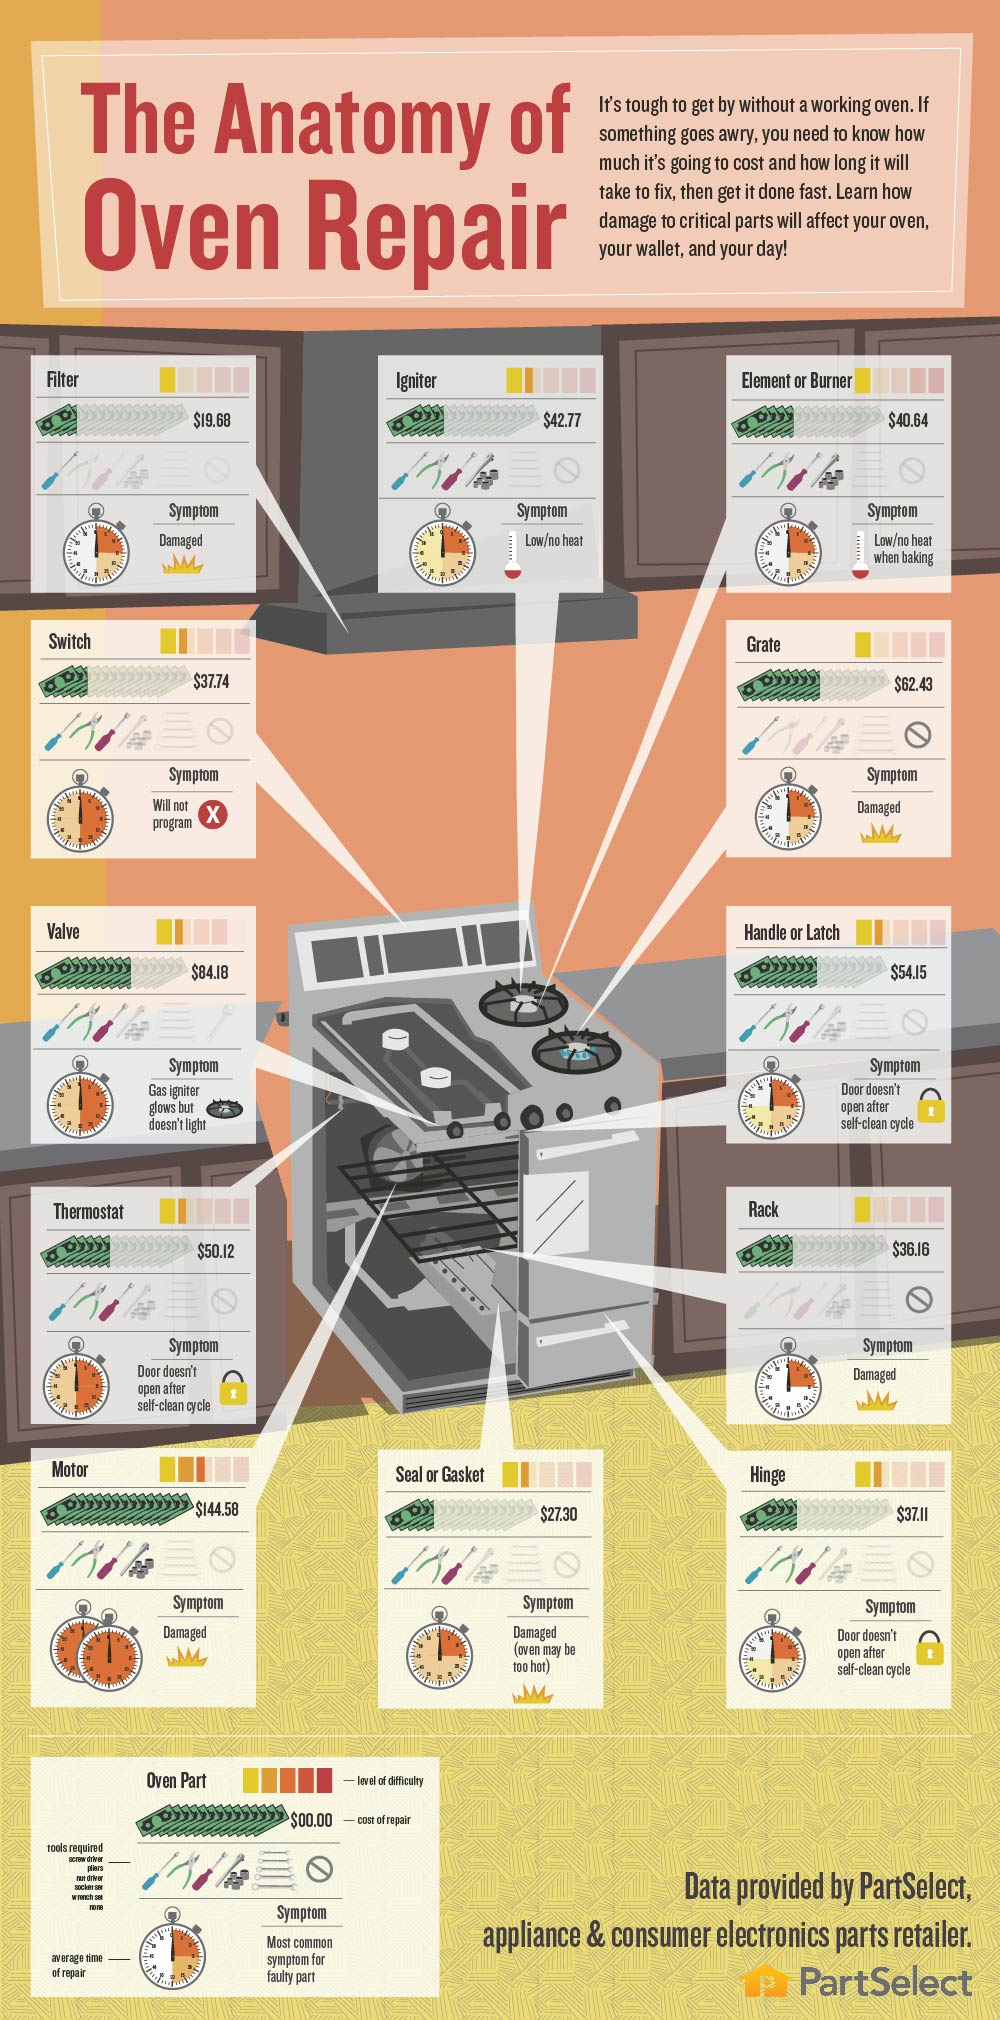 oven repair info graphic